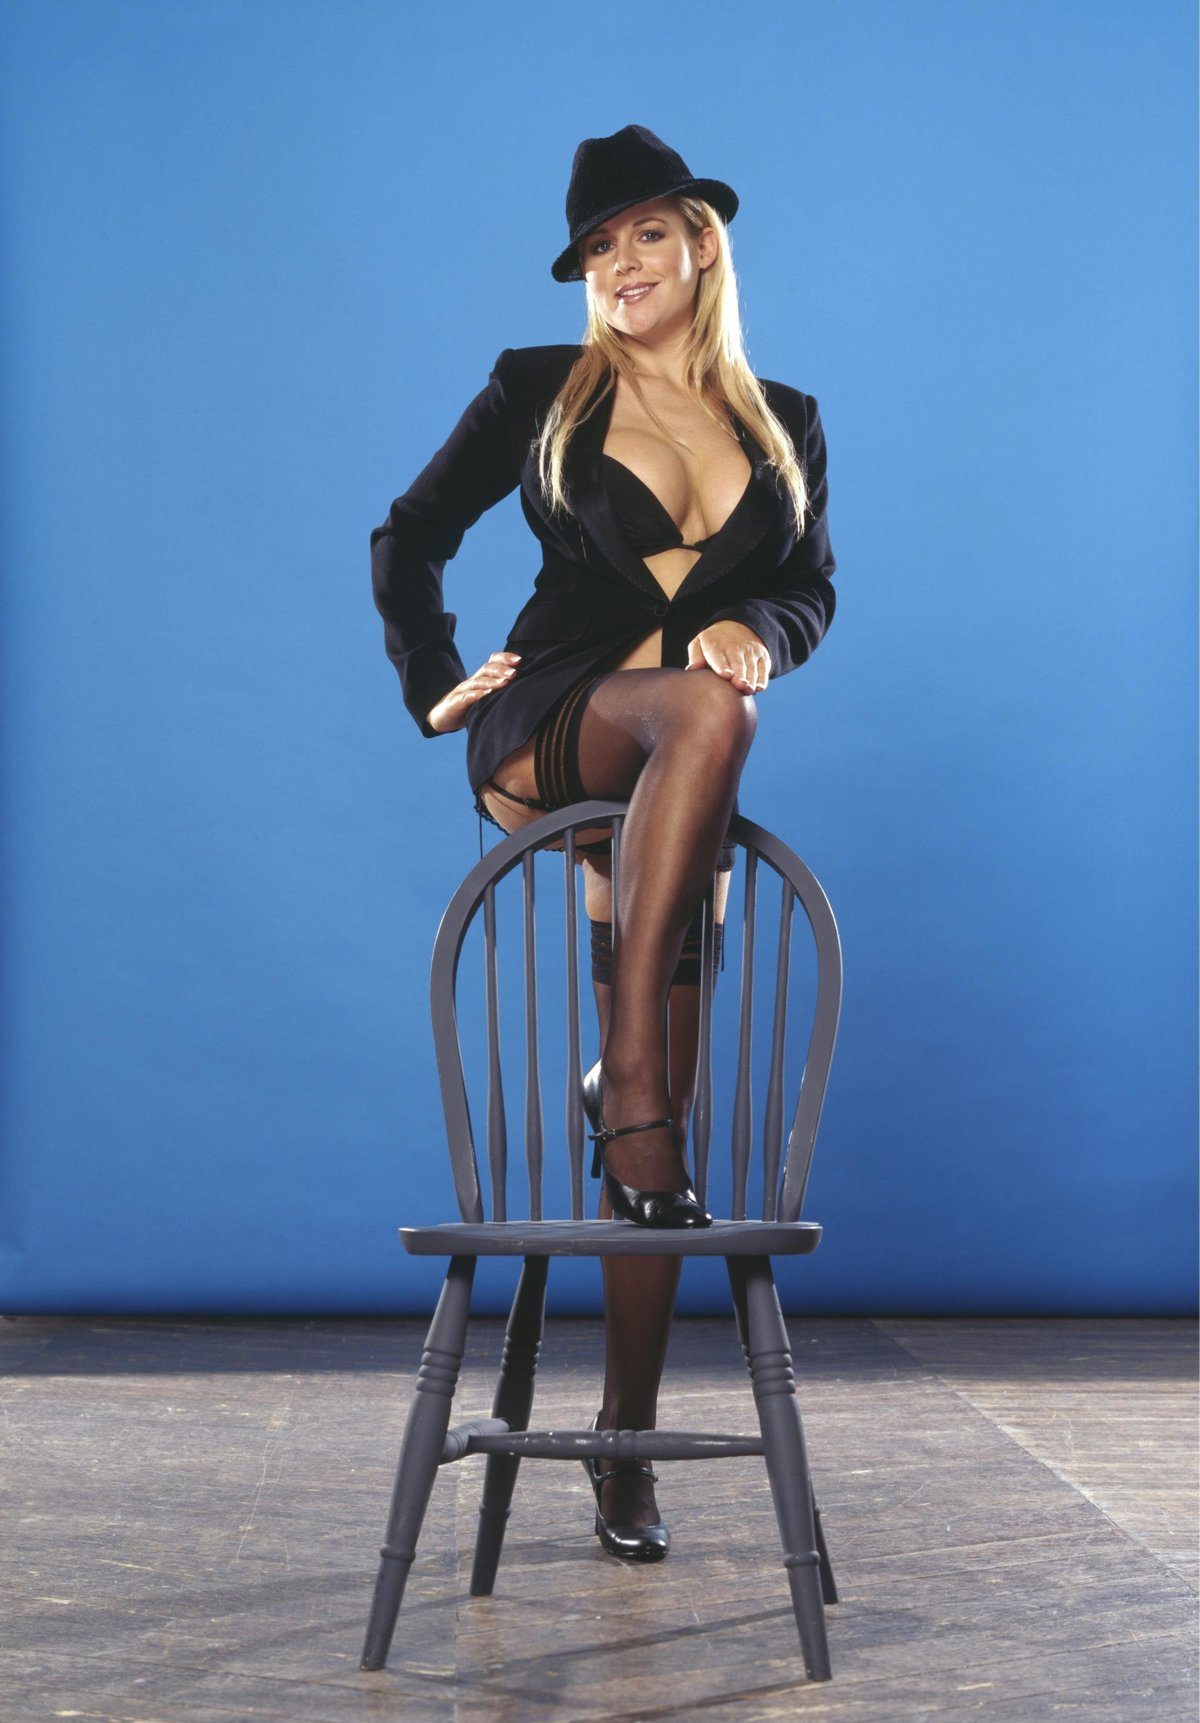 Смачную попку эро фото со стулом онлайн